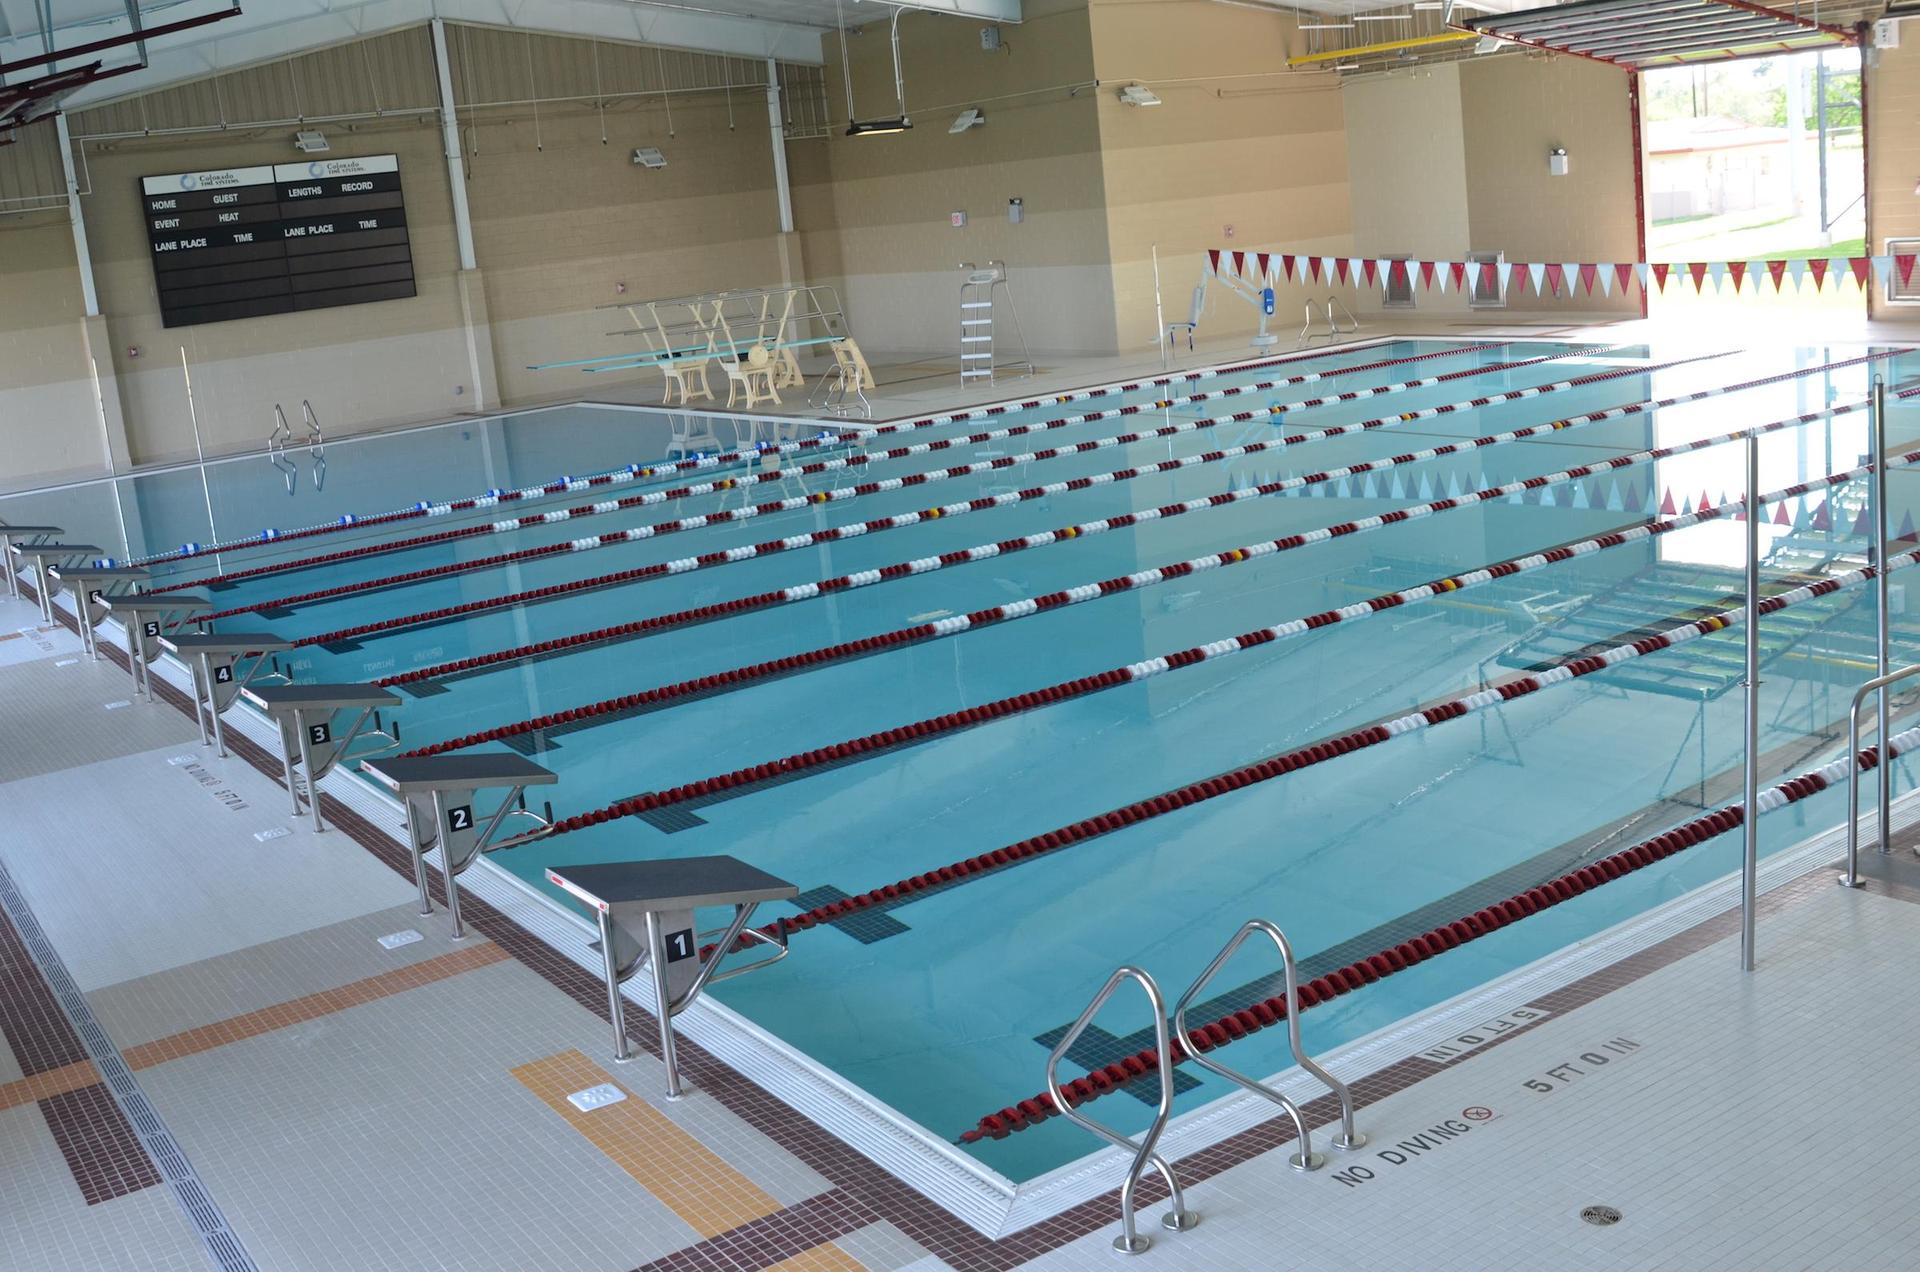 LFCISD Aquatic Center